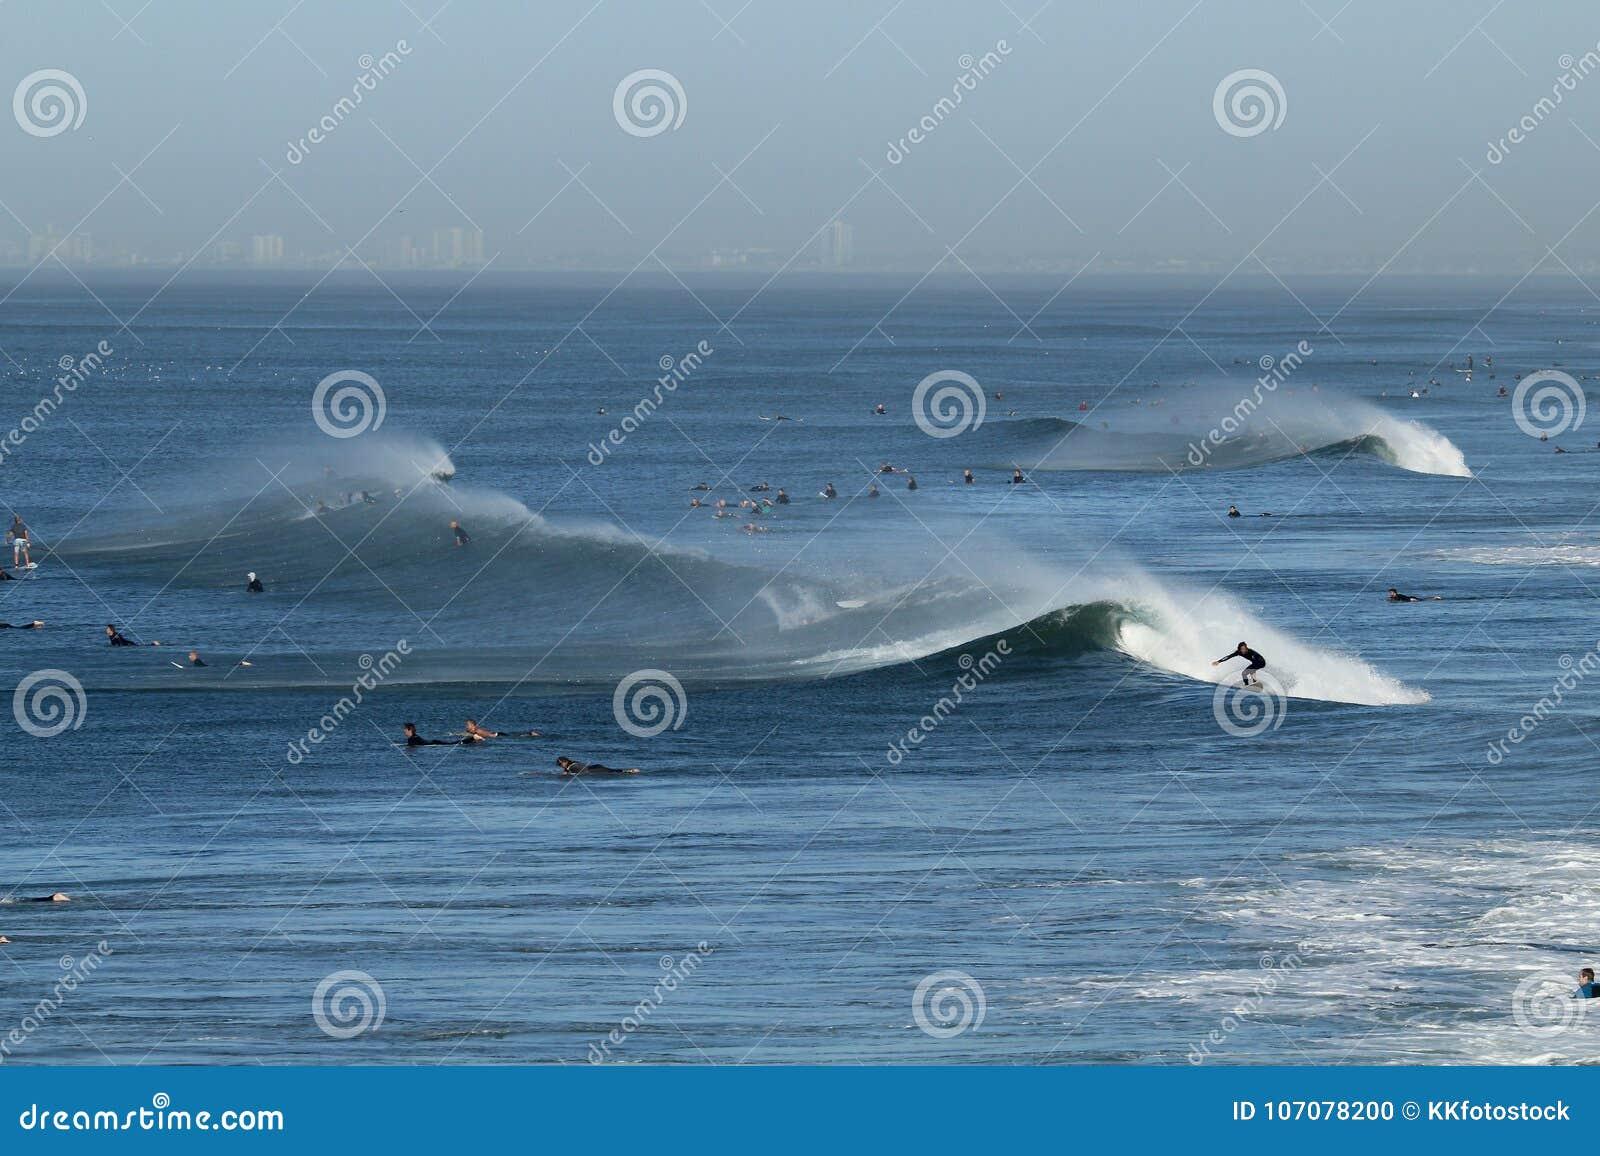 Surfers In The Ocean Off The Coast Of Huntington Beach California